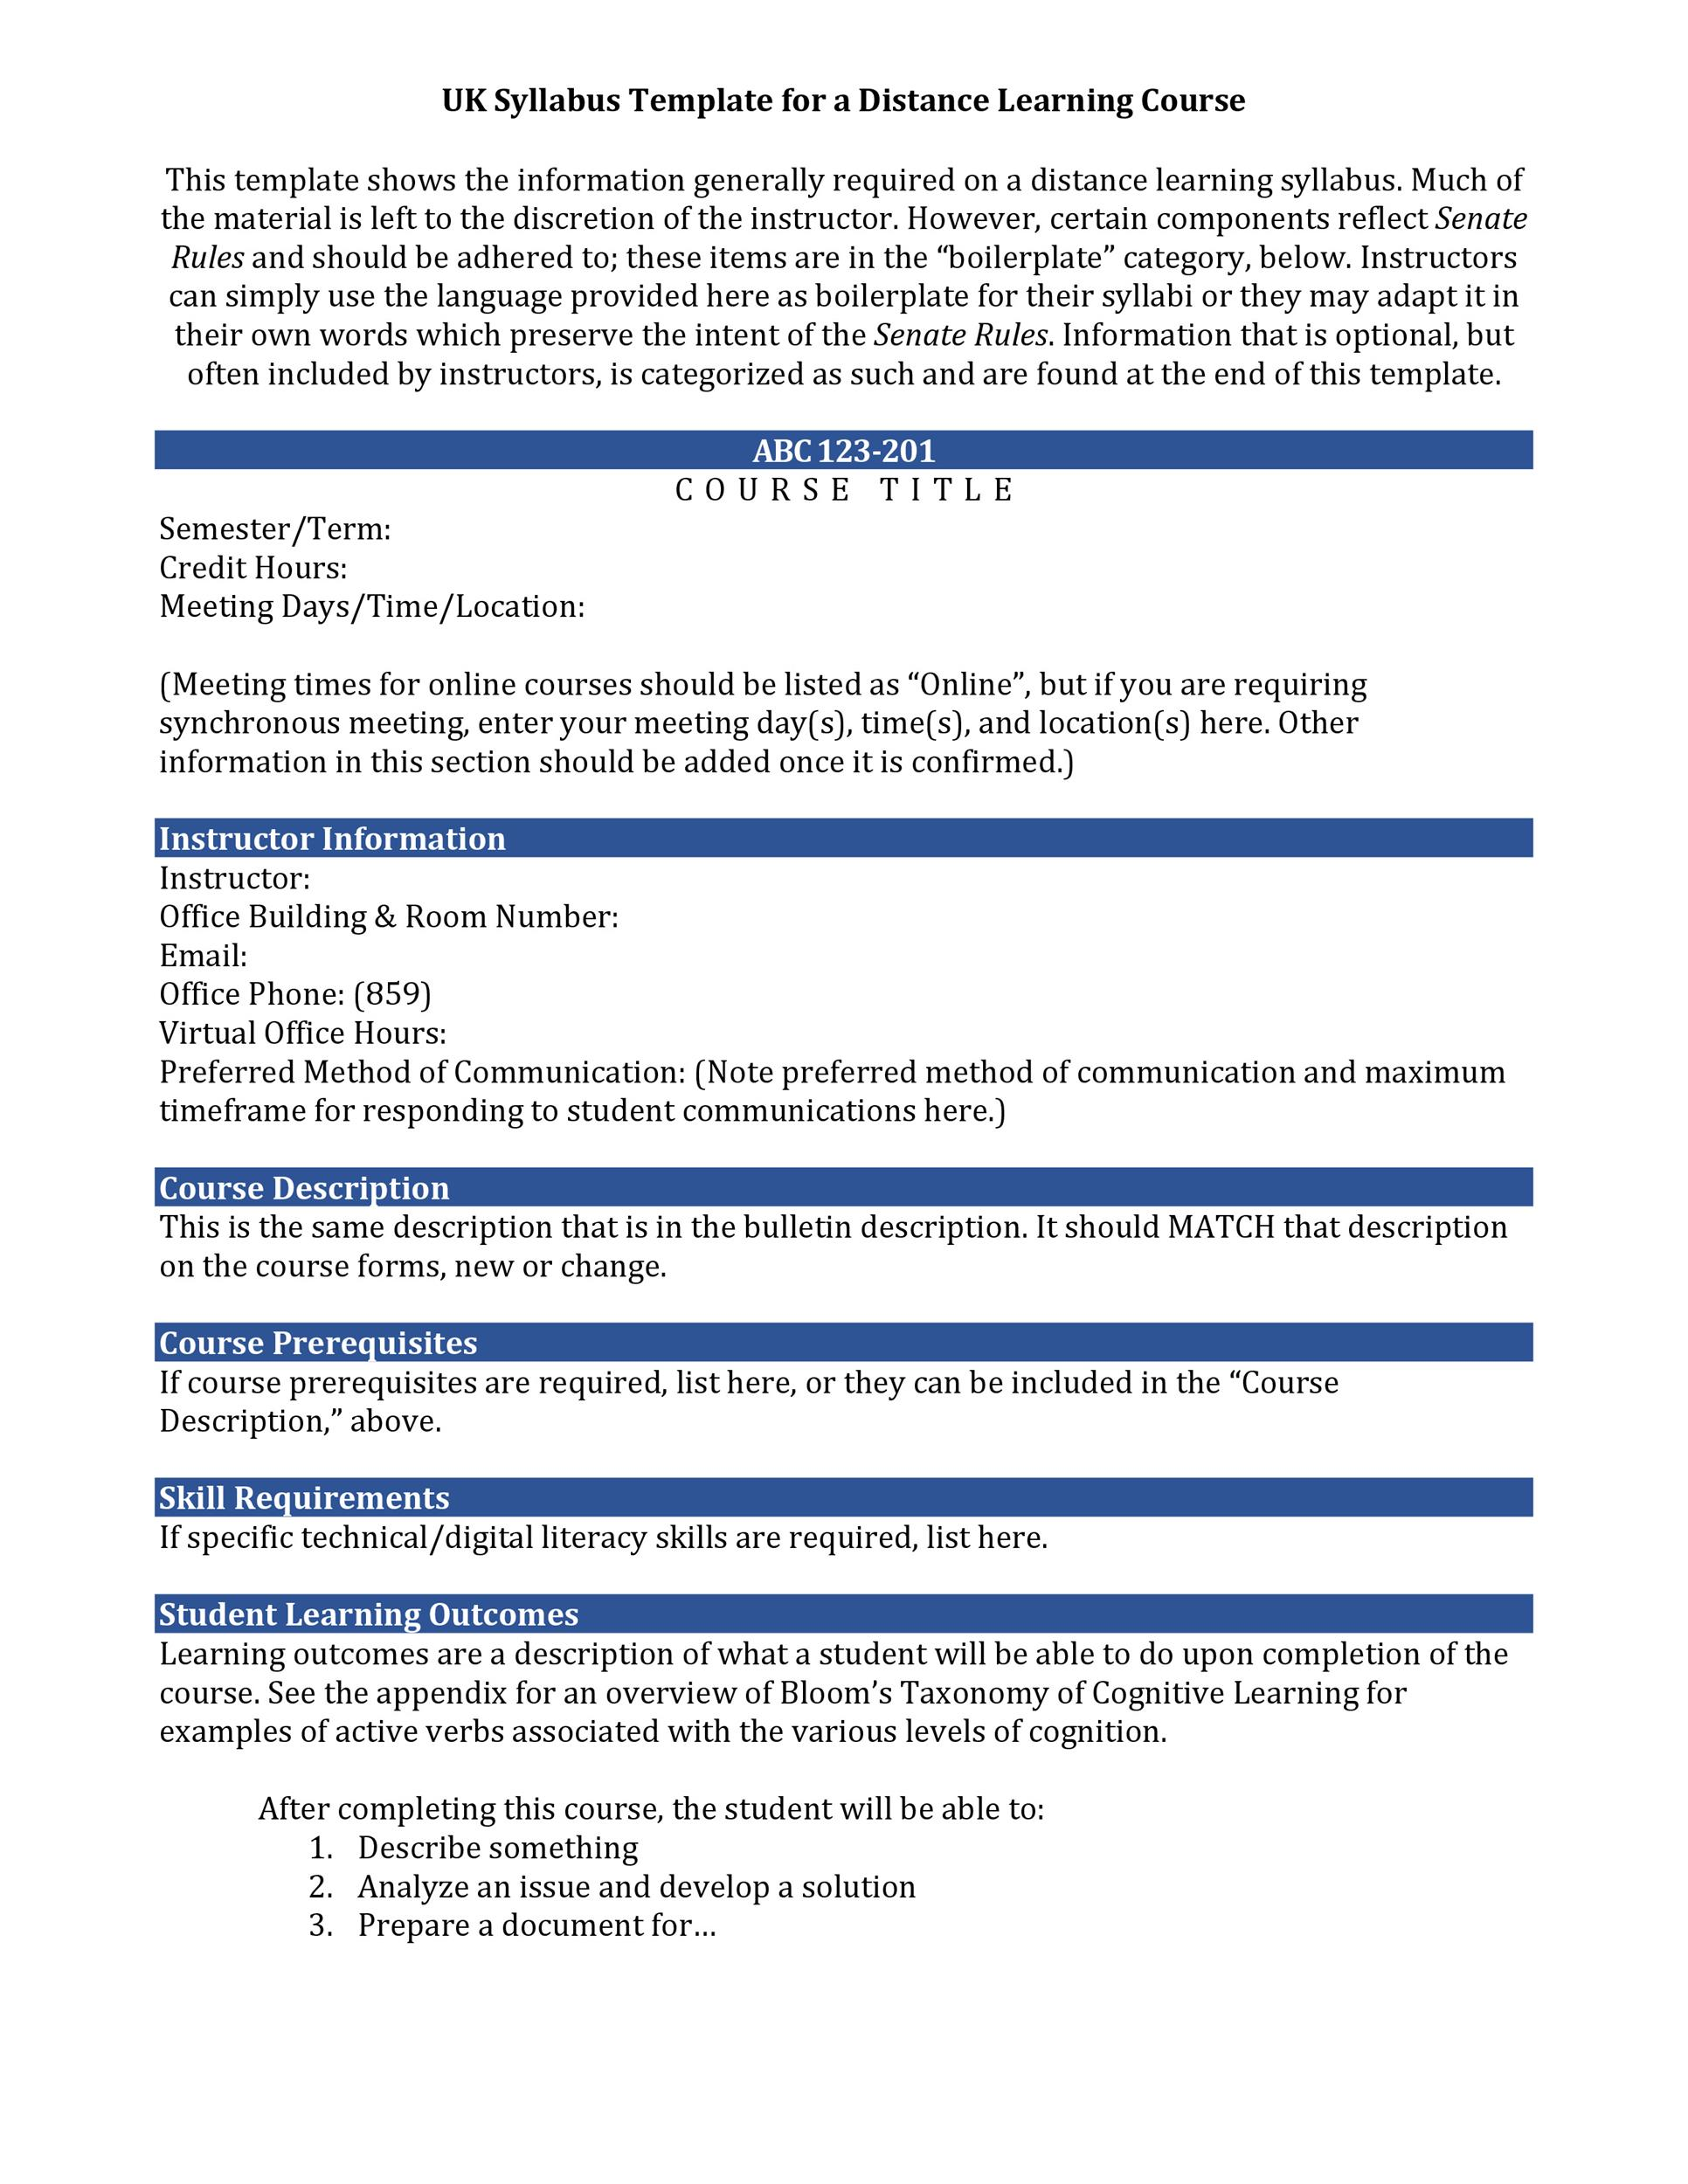 Free sylabus template 34